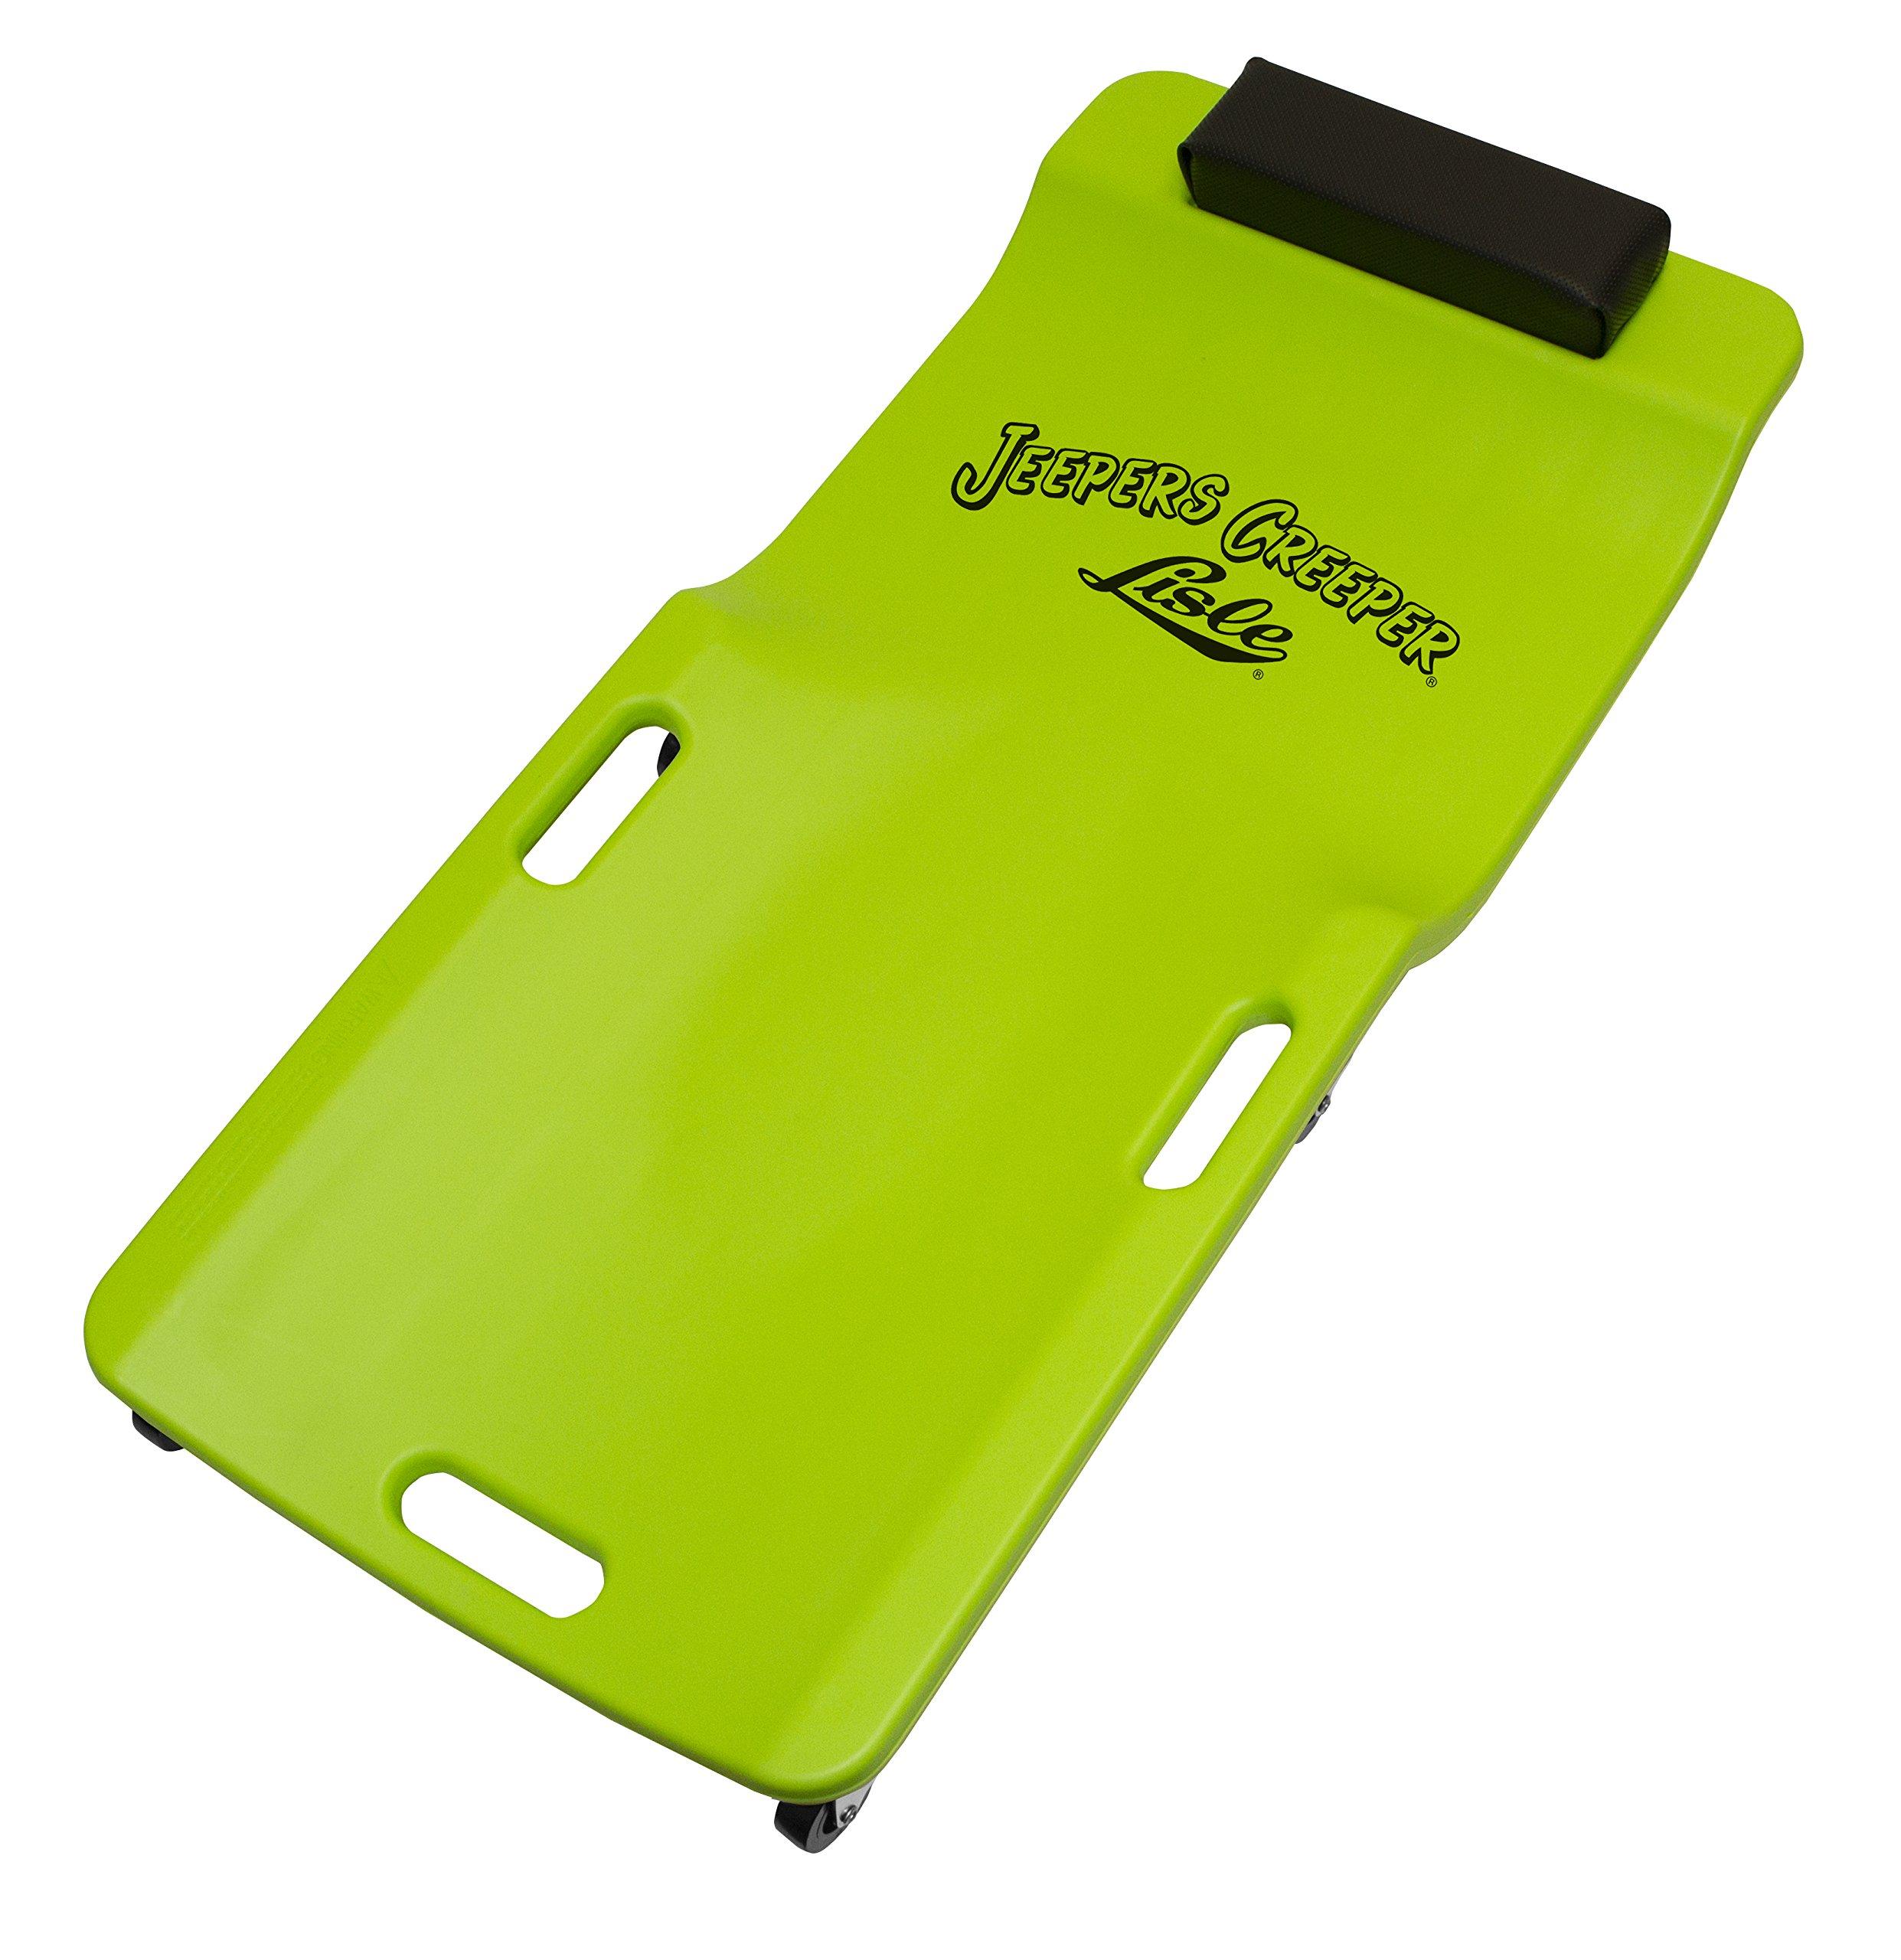 Lisle 99102 Green Neon Low Profile Plastic Creeper by Lisle (Image #1)